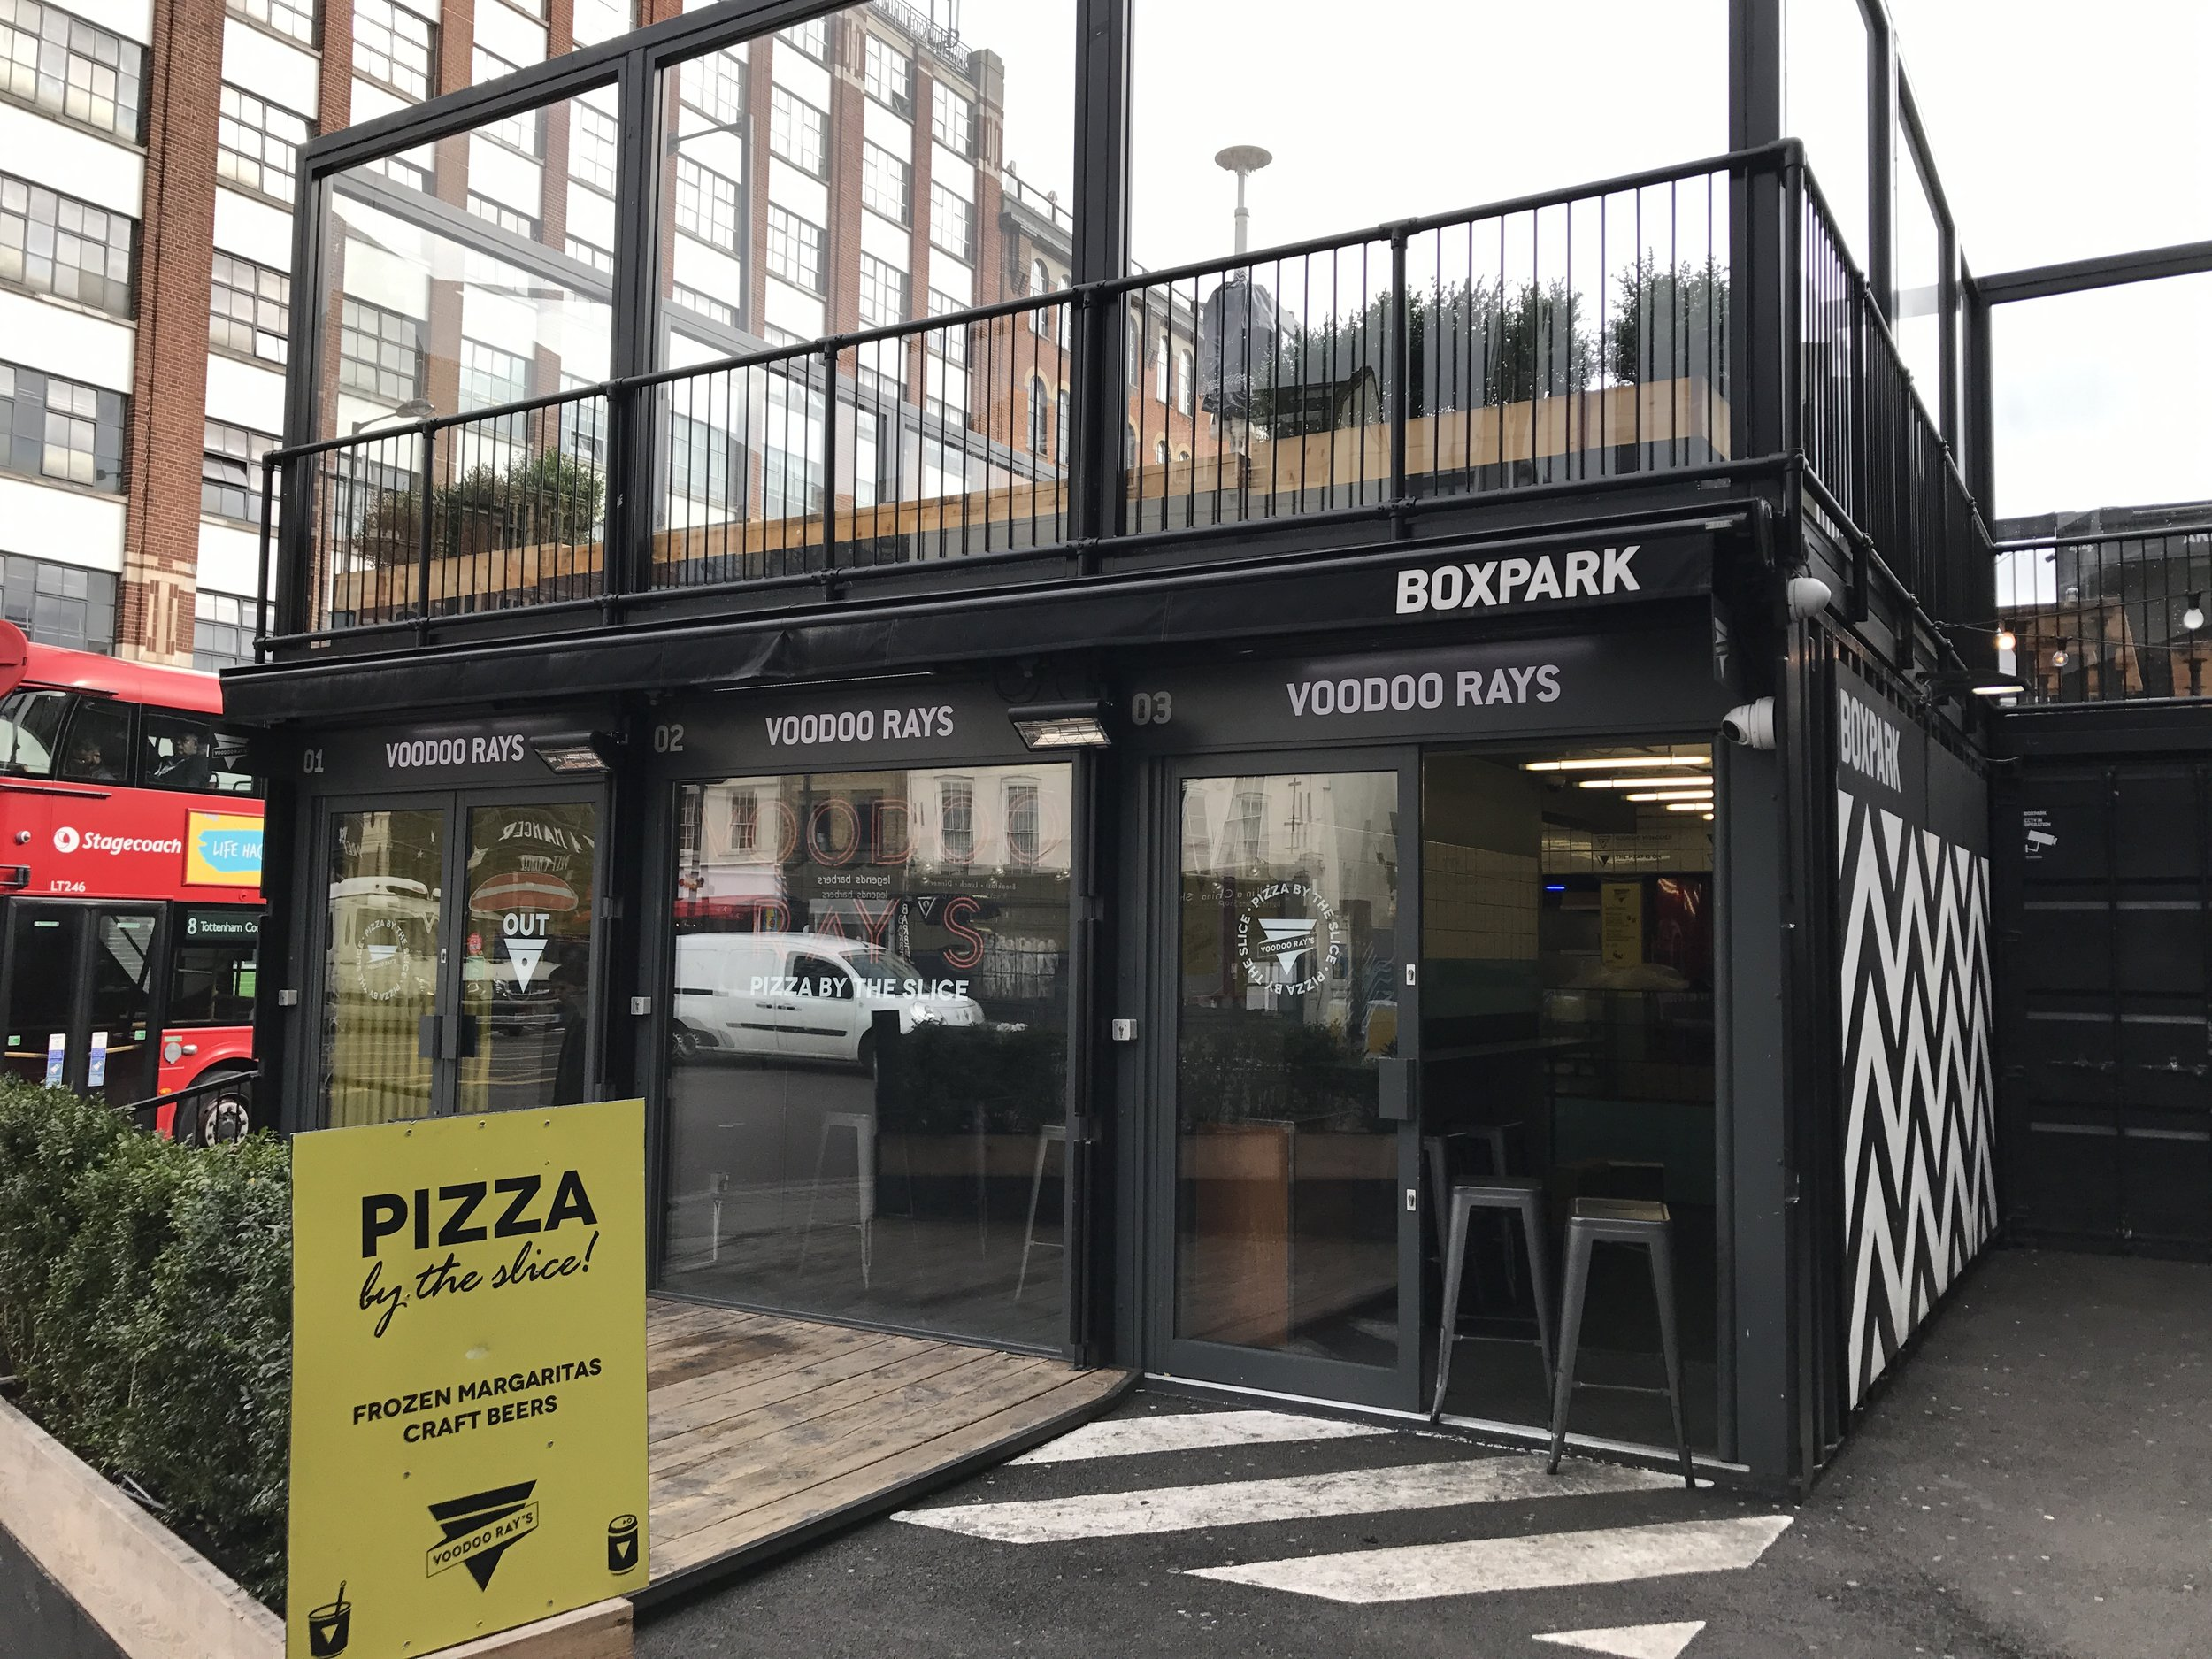 East London – Boxpark Shoreditch